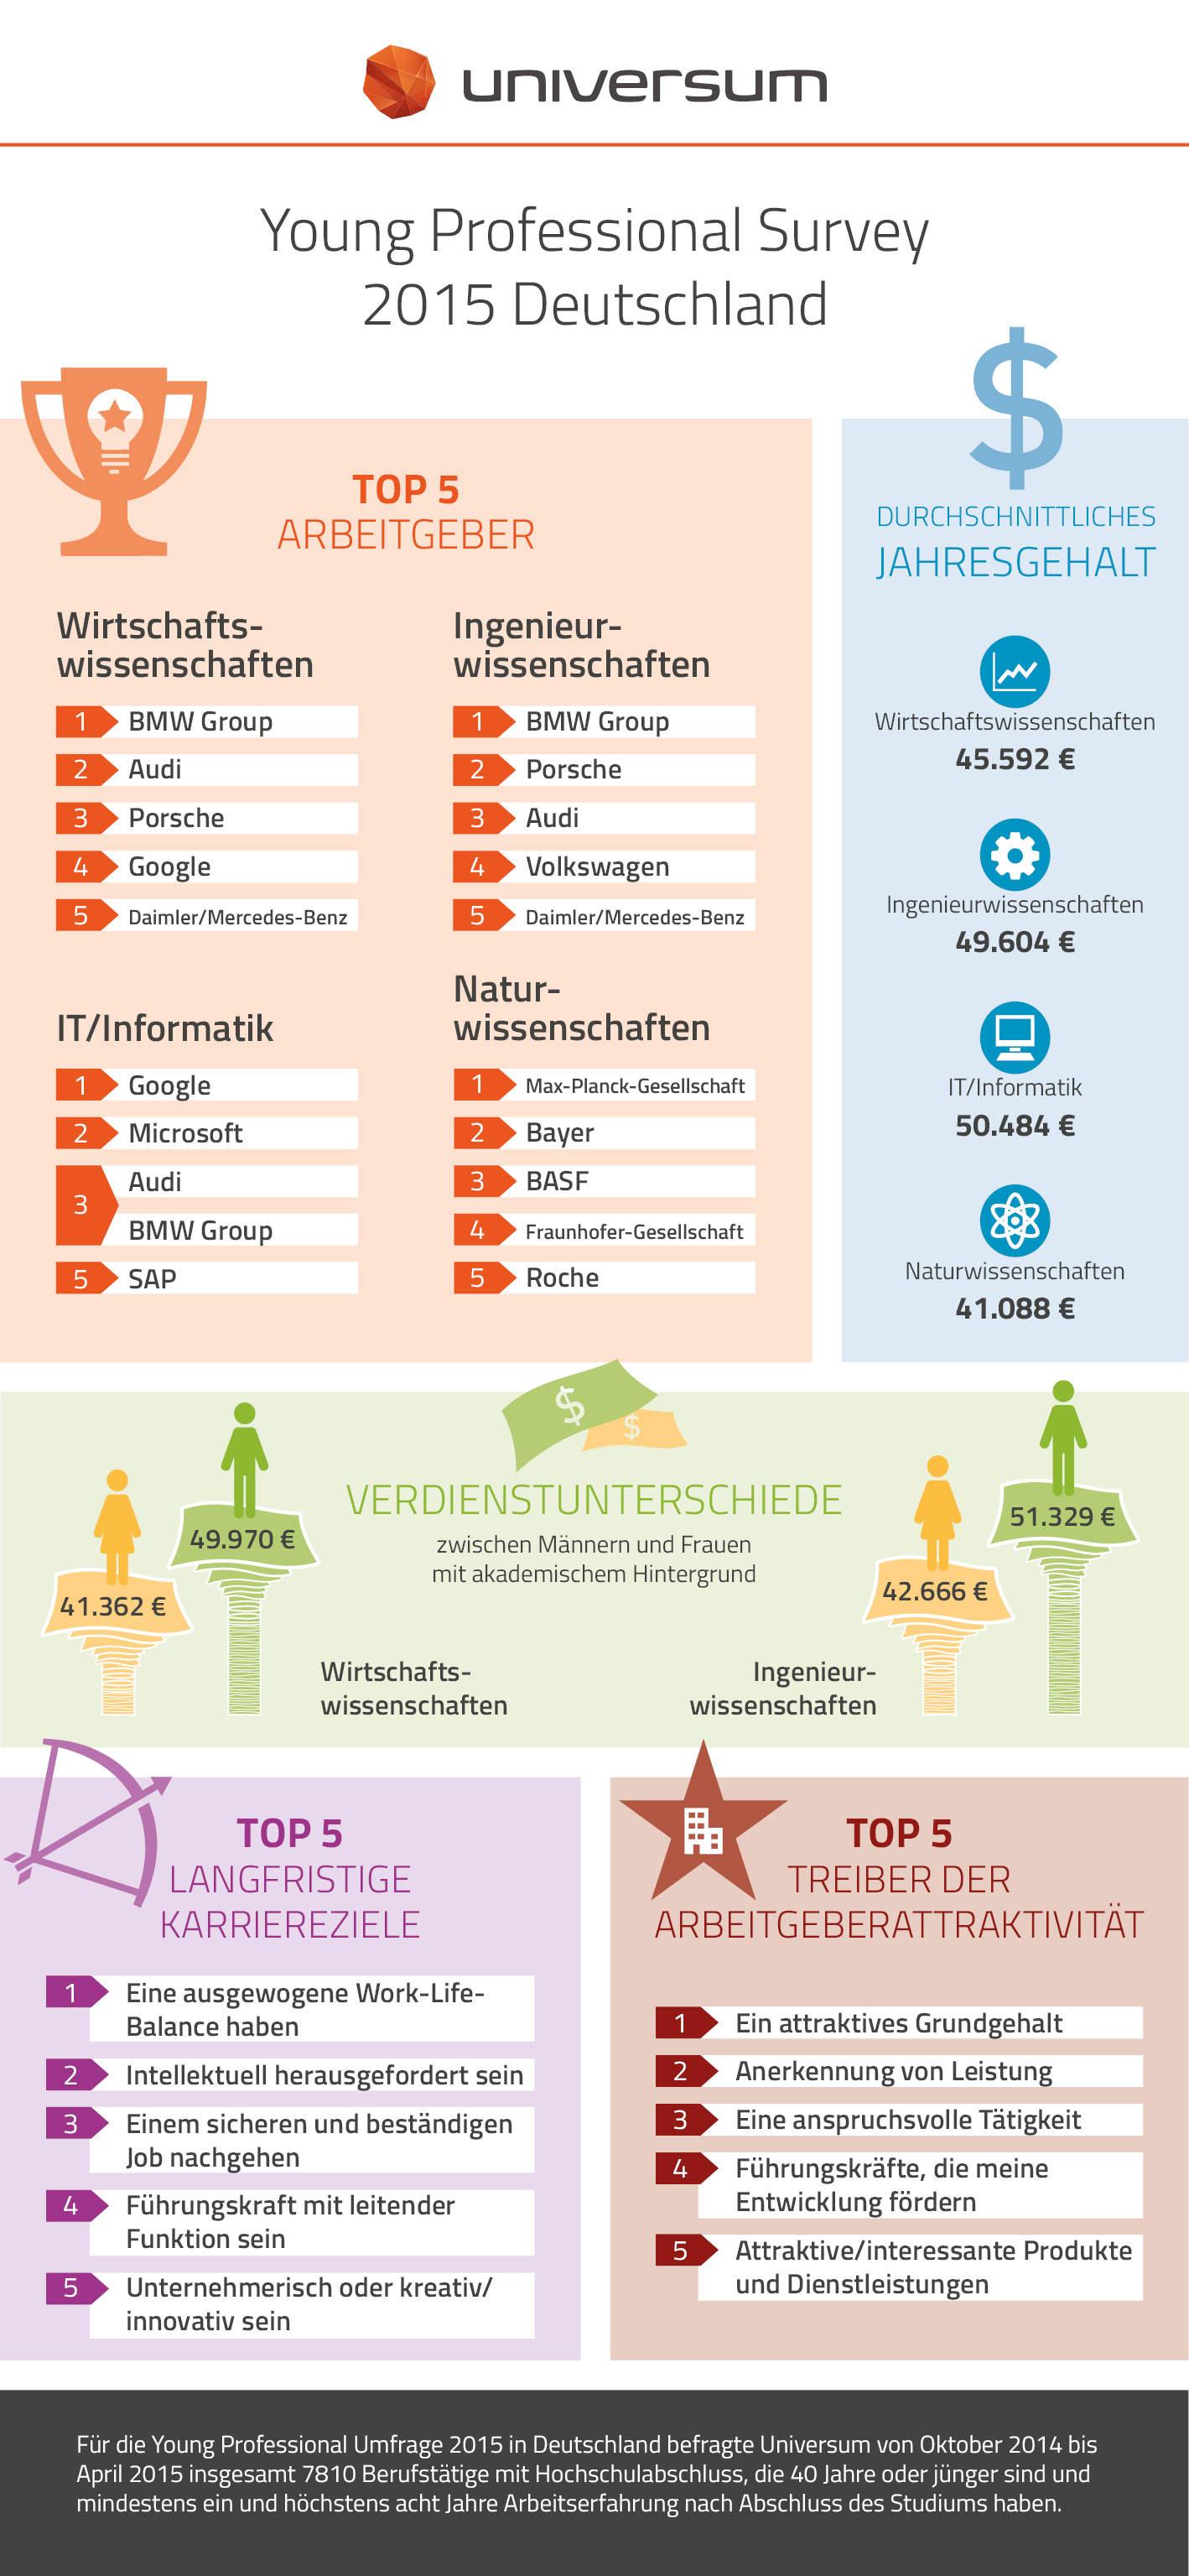 Infografik zur Universum Young Professional Study 2015.